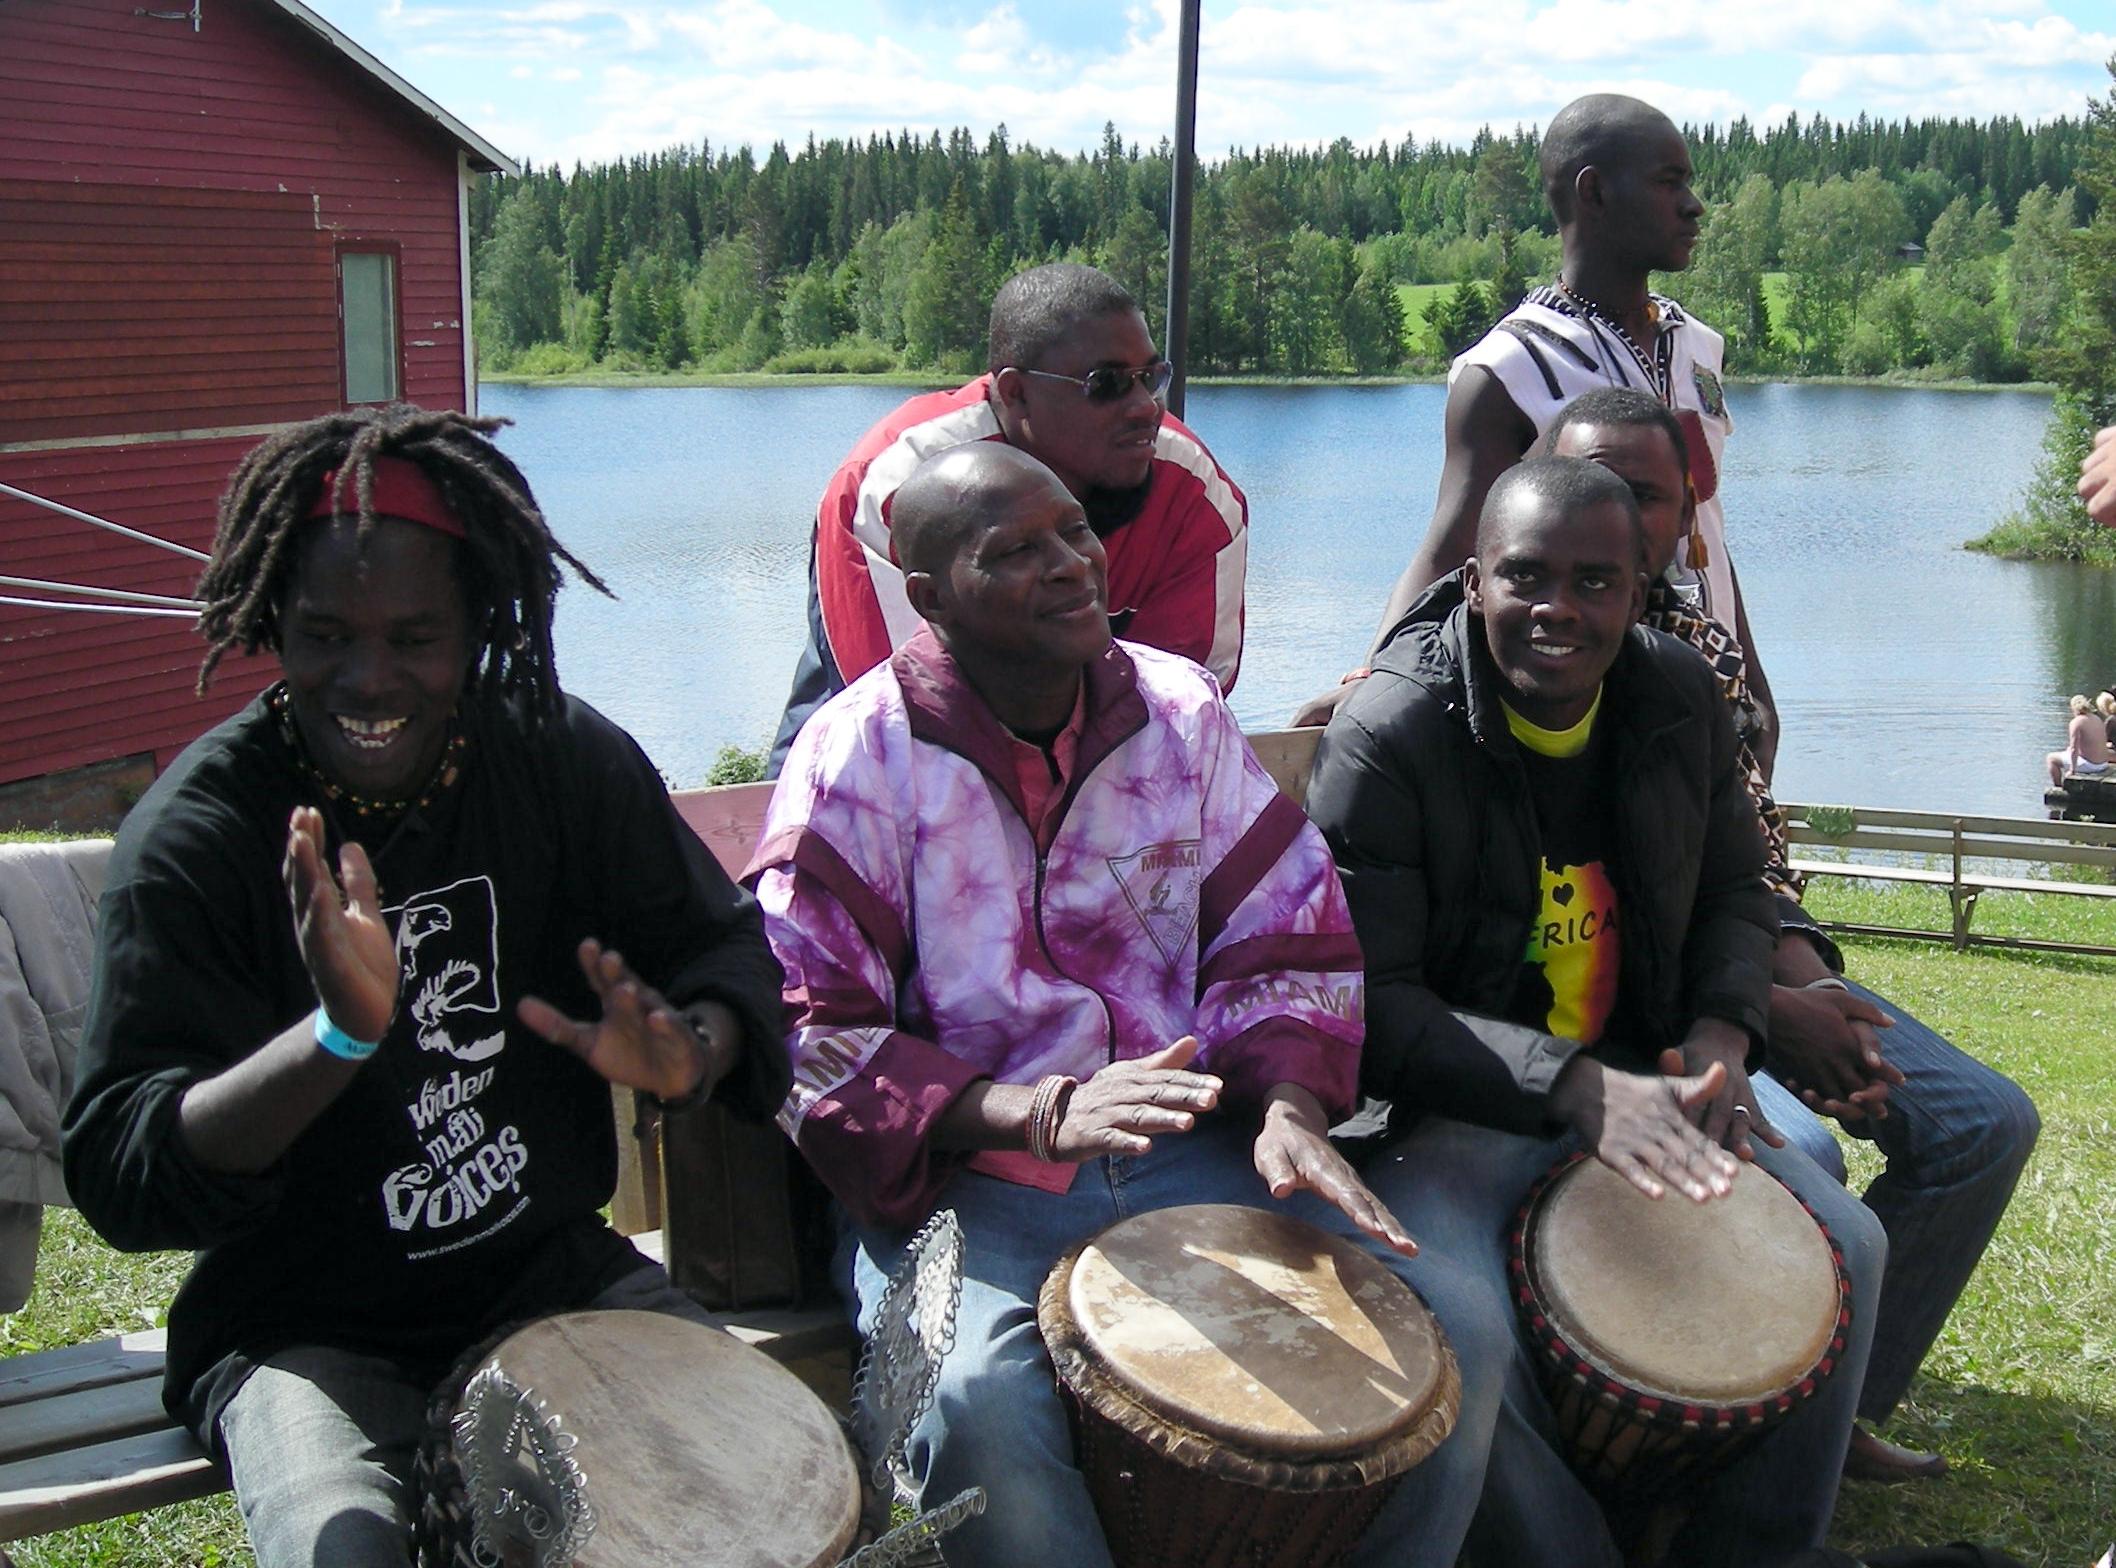 Aba Cisse playing a solo with Sidi Toure and Oumar Konate, Fröjdholmen 2010.